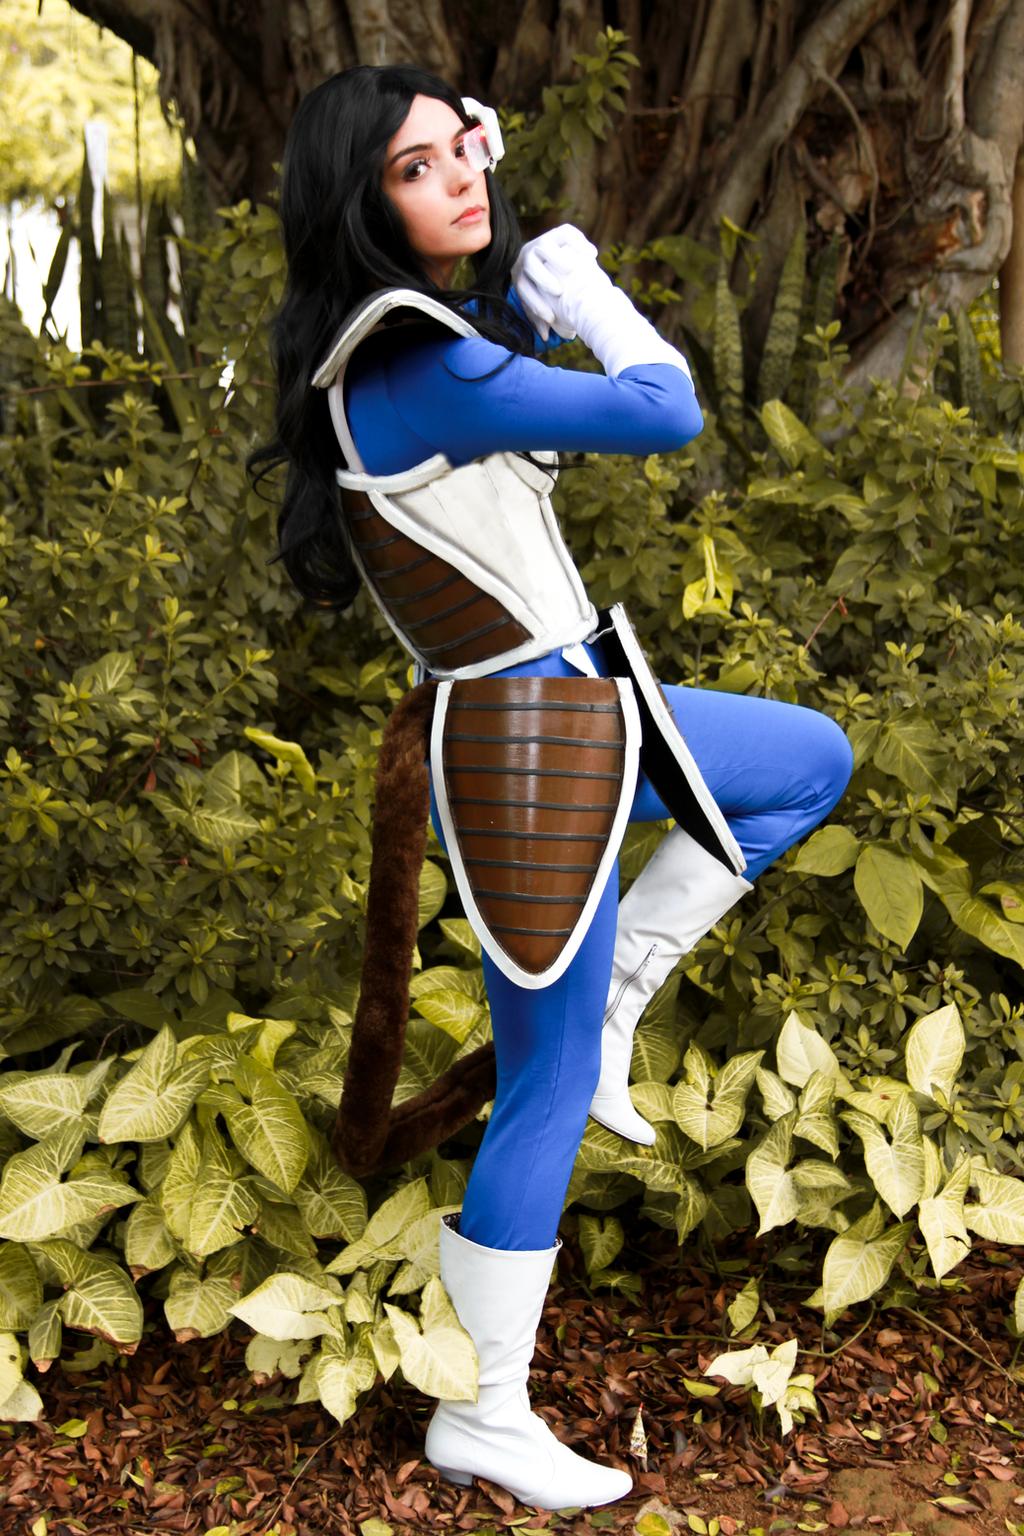 ball female cosplay Dragon